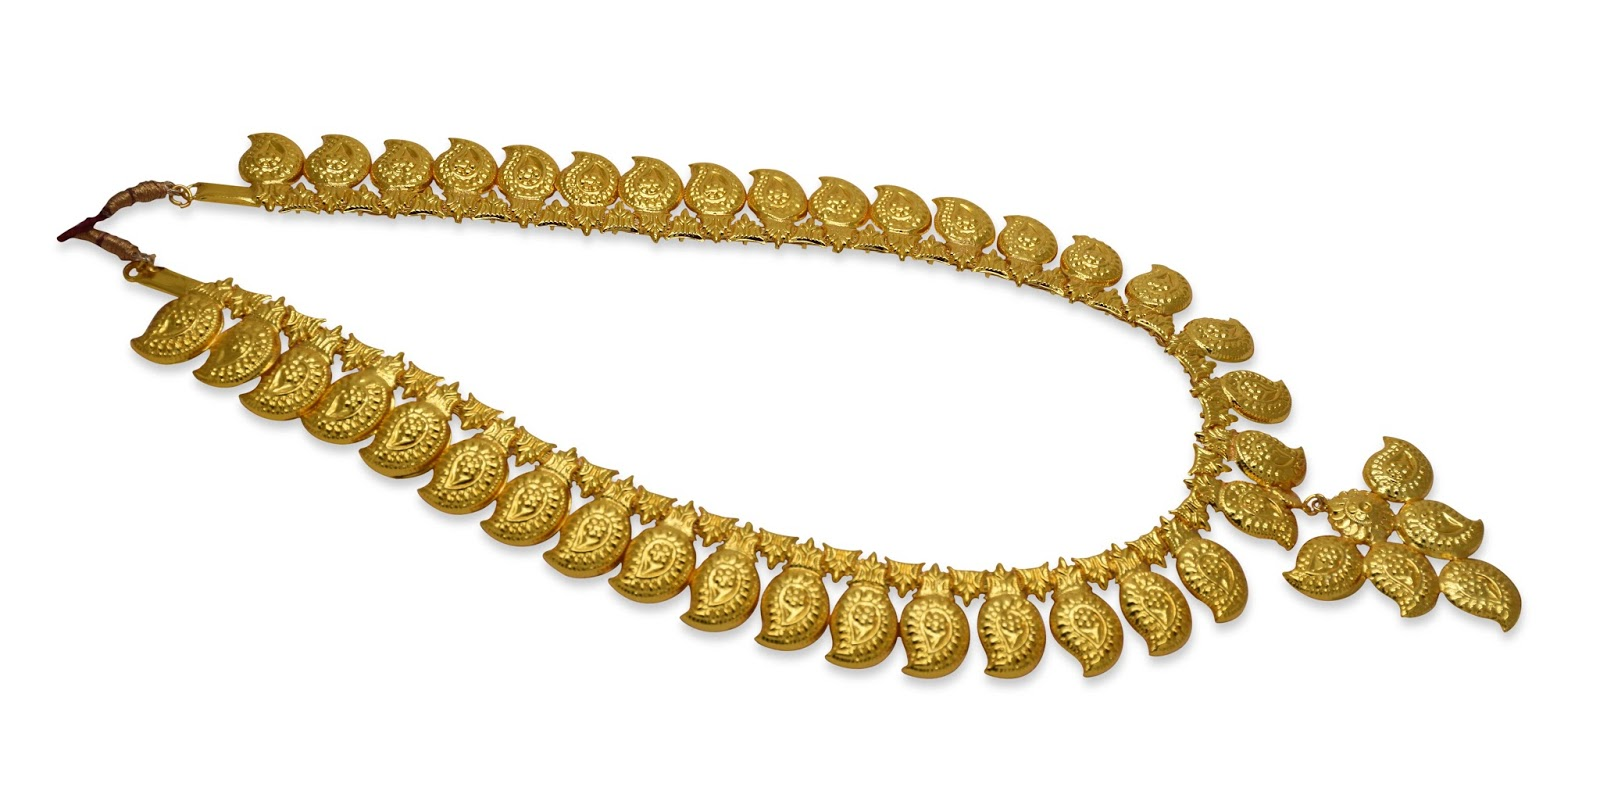 a23cdf8cca0 Kollam Supreme Premium Fashion Jewellery  Buy Imitation Big Mango ...